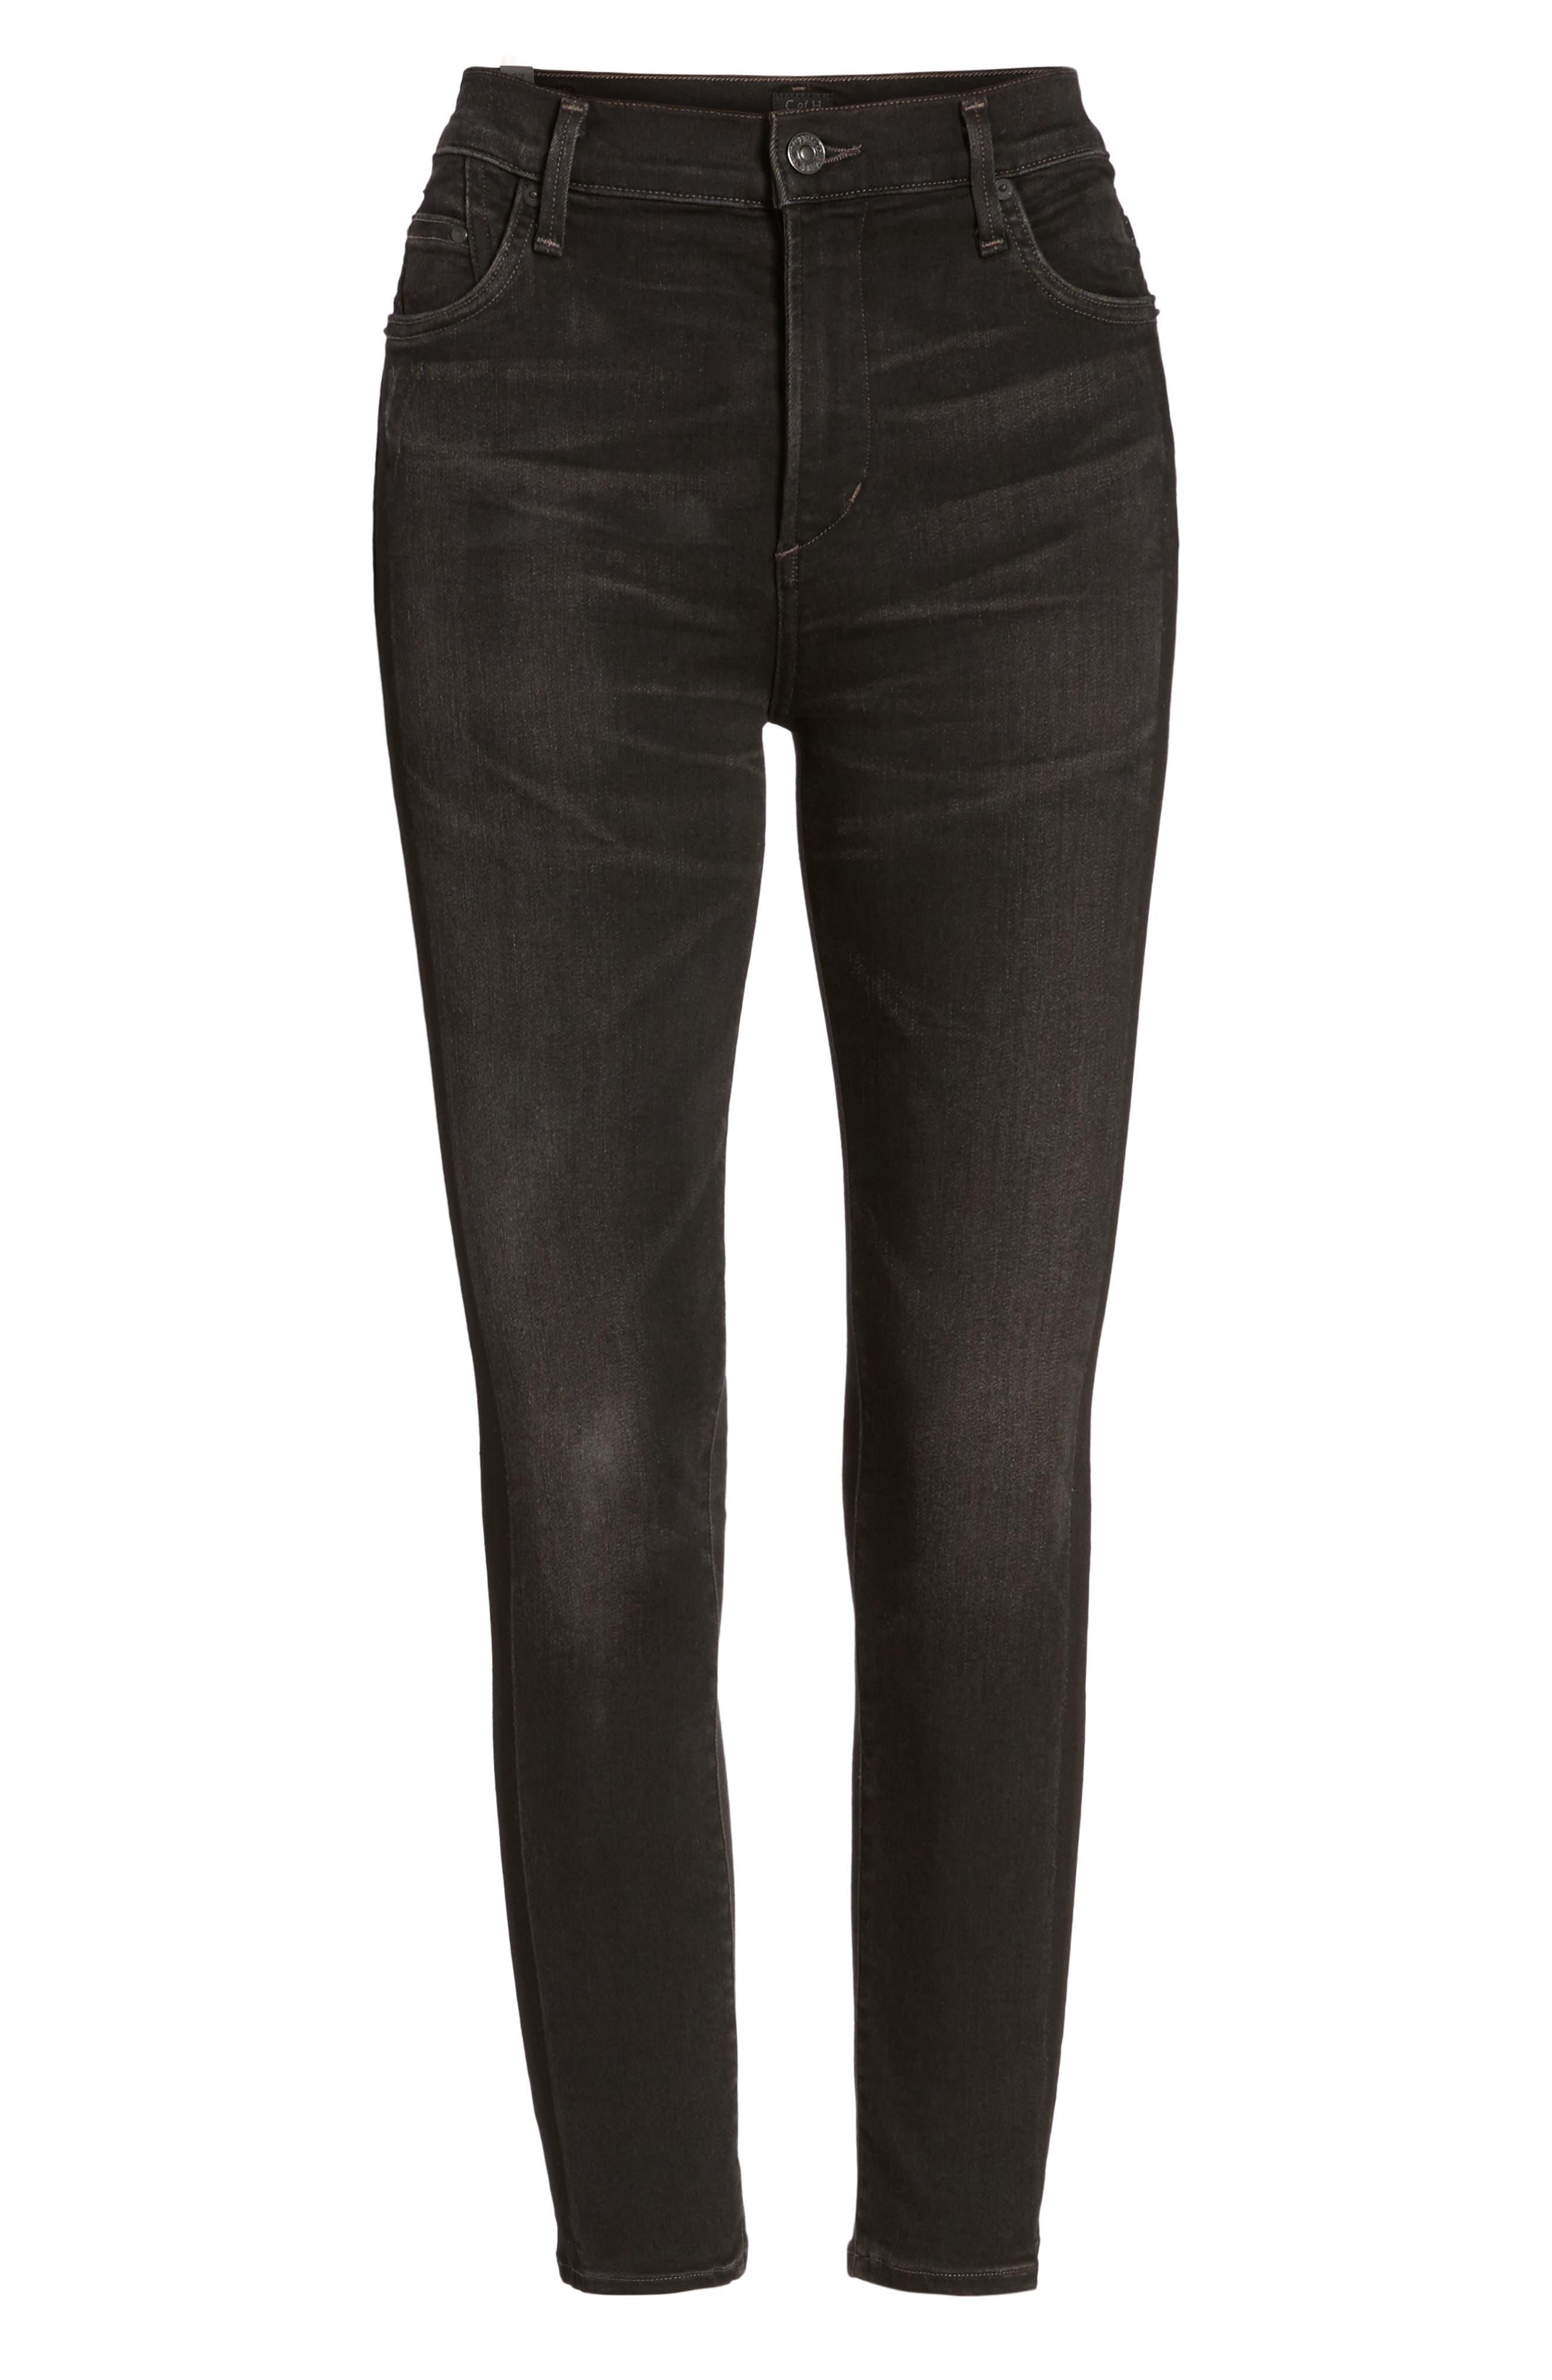 Rocket High Waist Crop Skinny Jeans,                             Alternate thumbnail 6, color,                             009